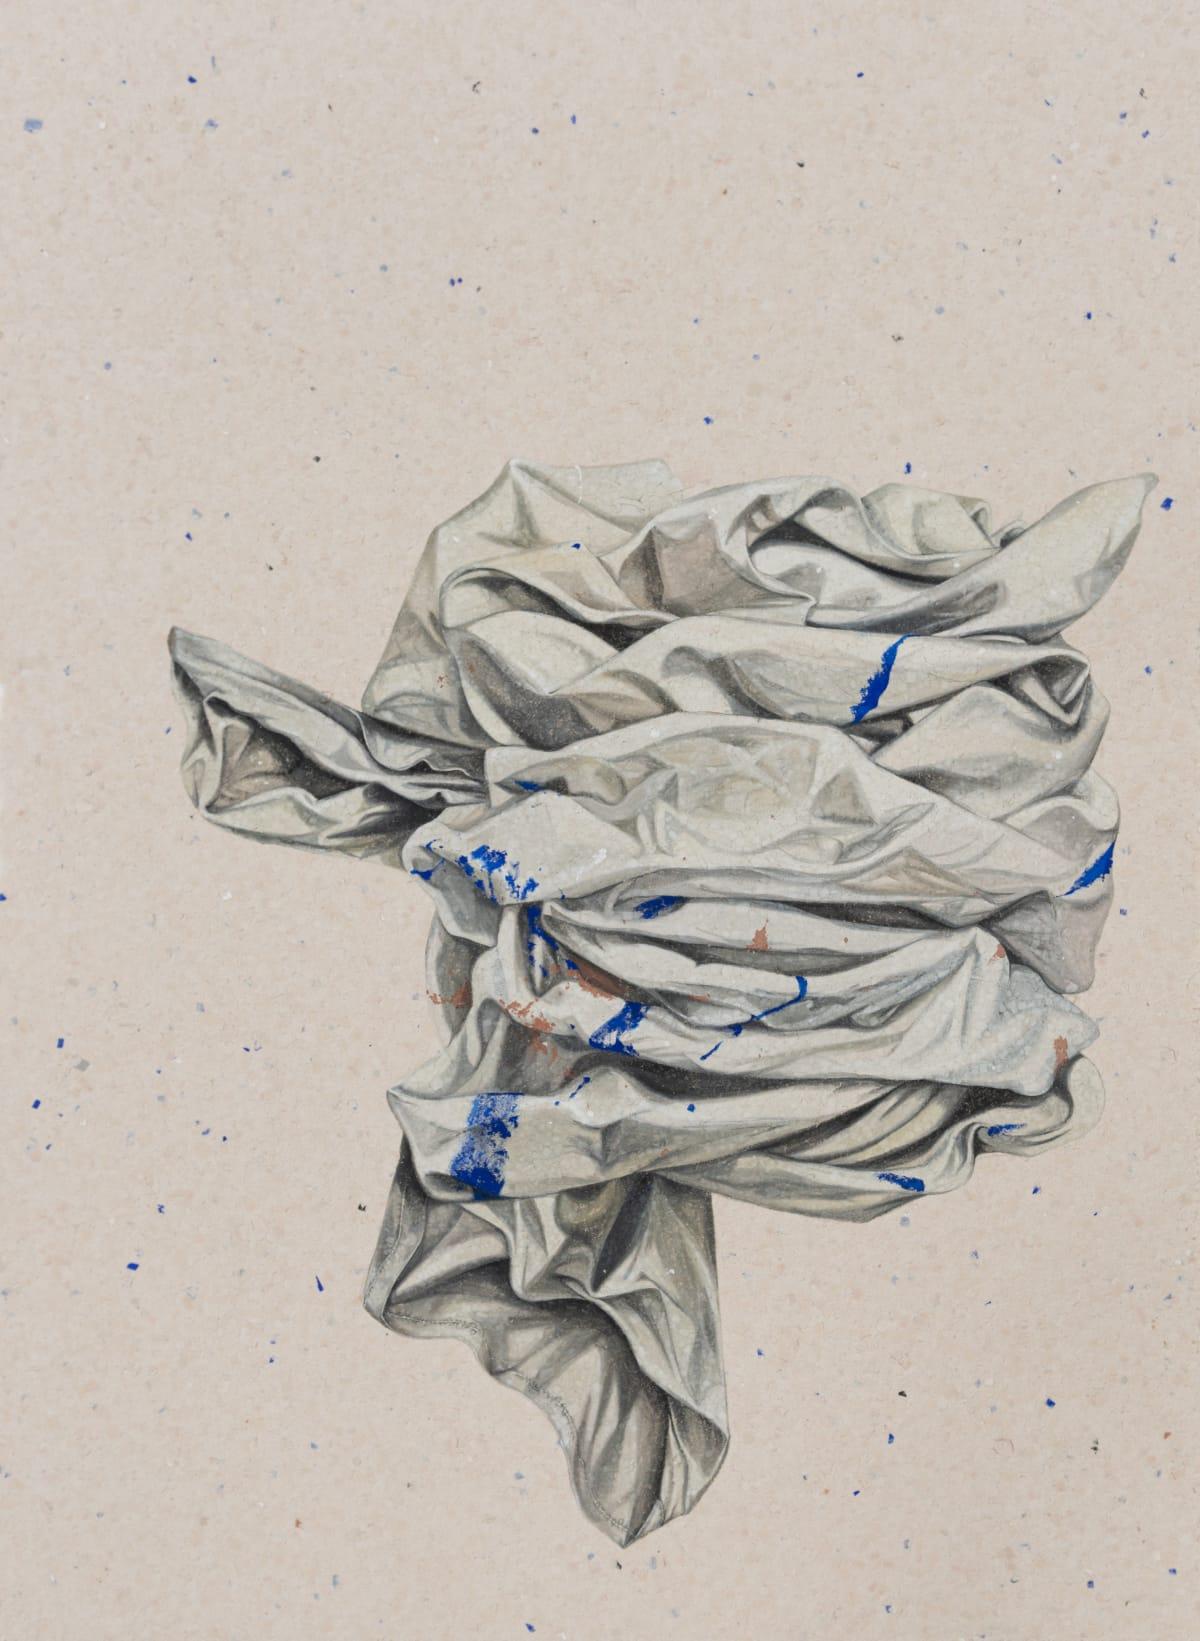 Marita Hewitt, Still Here (blush dust), 2019